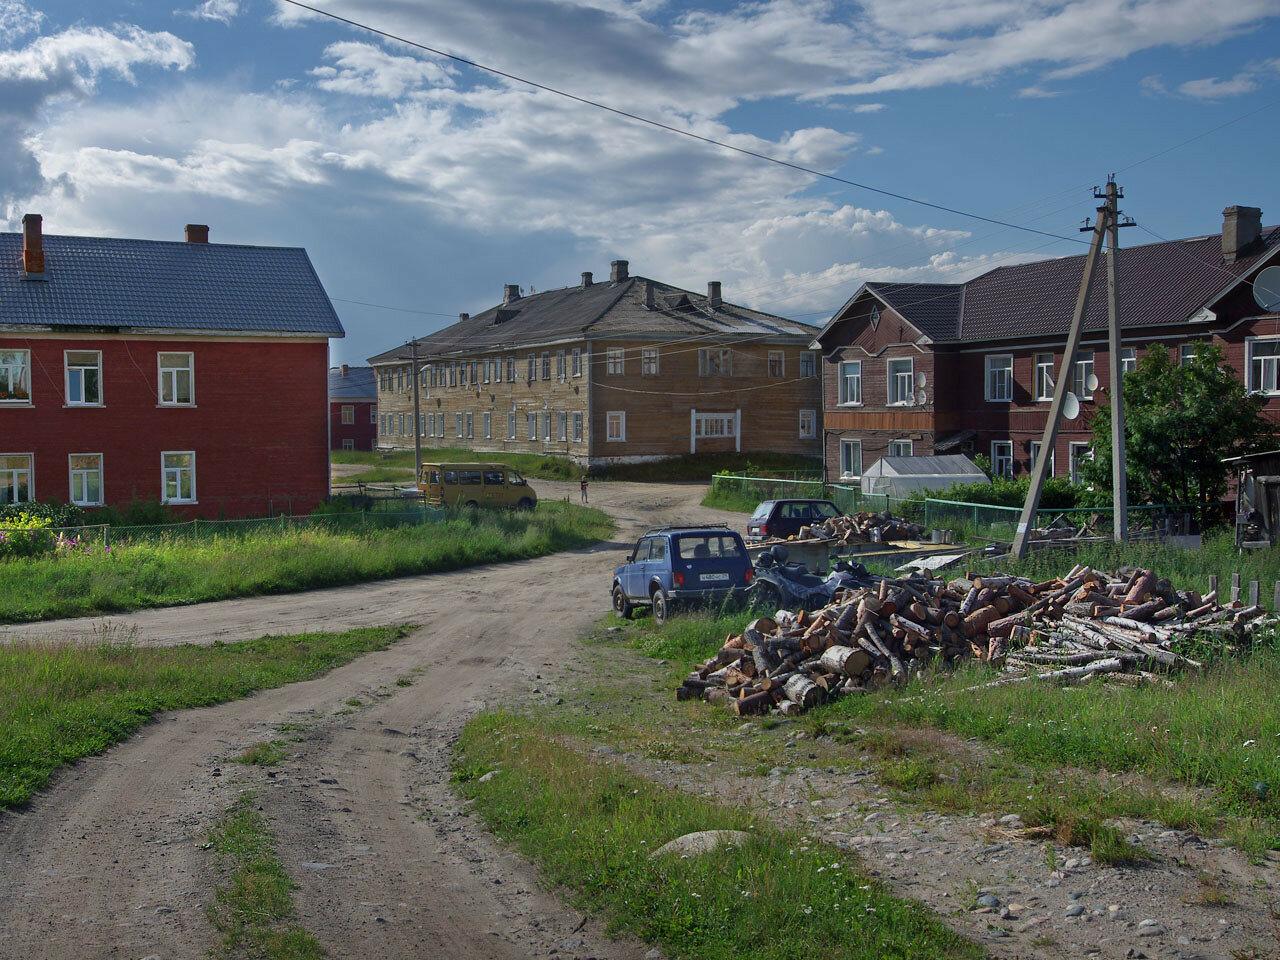 Соловецкий поселок. Автор фото: Юрий Семенов